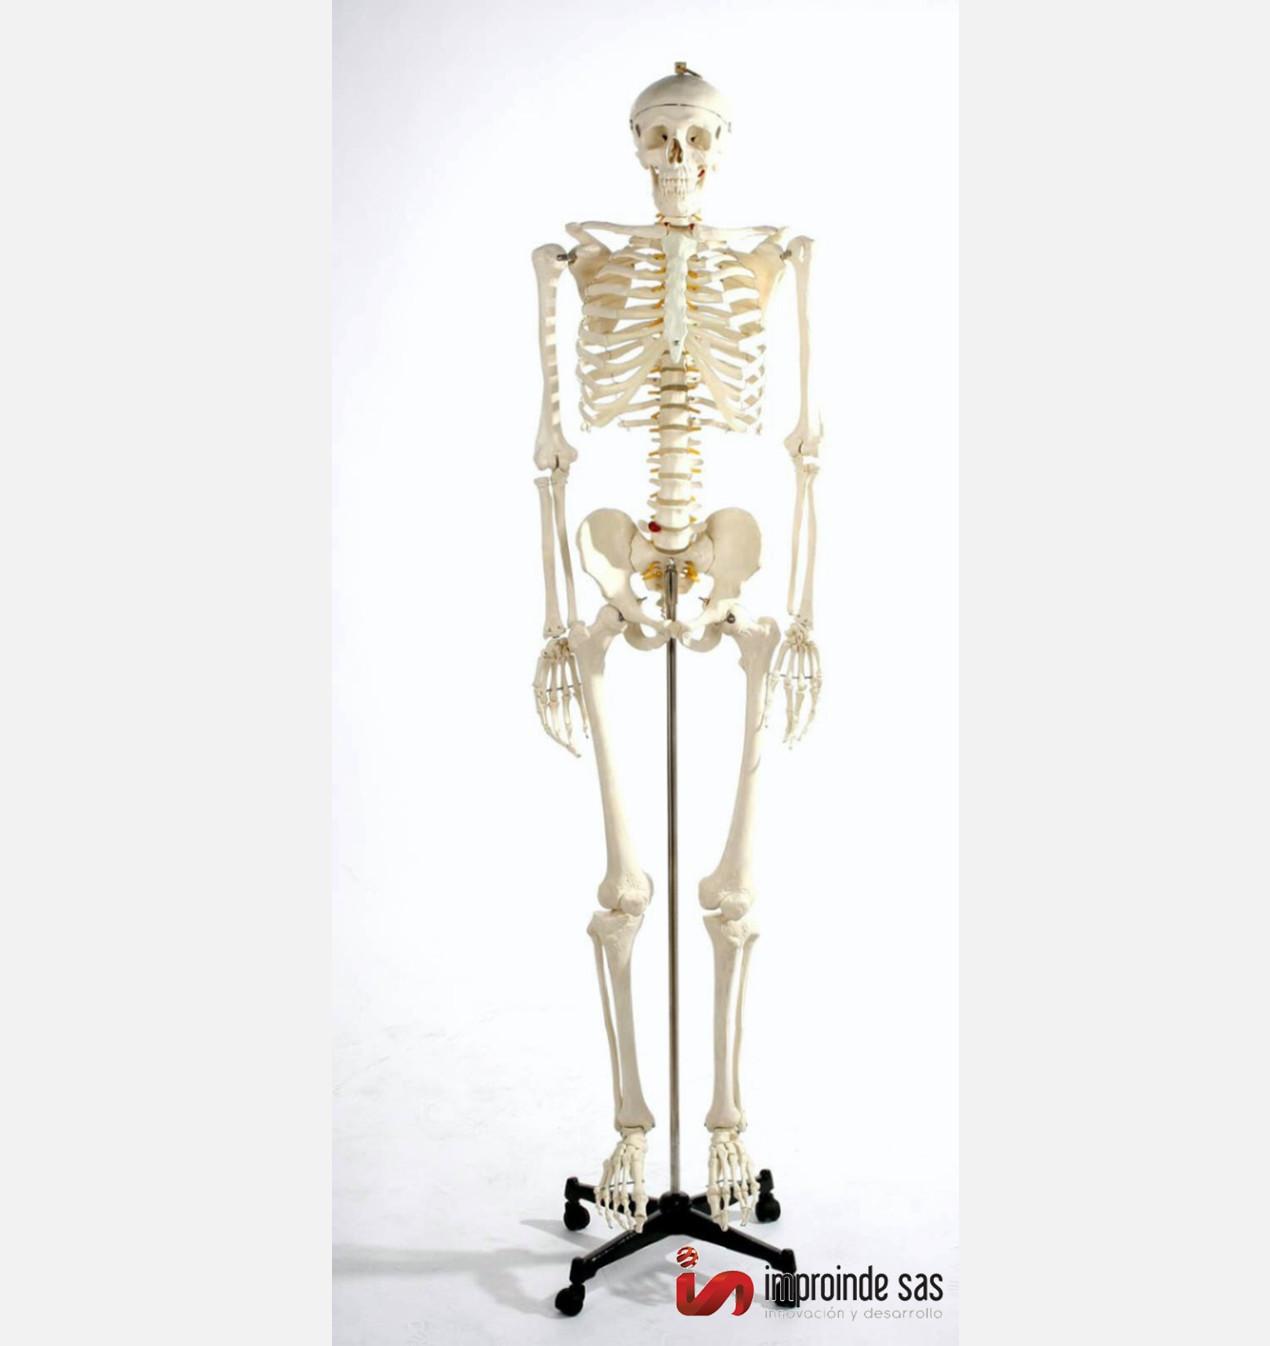 IMPROINDE SAS | Modelos Anatòmicos